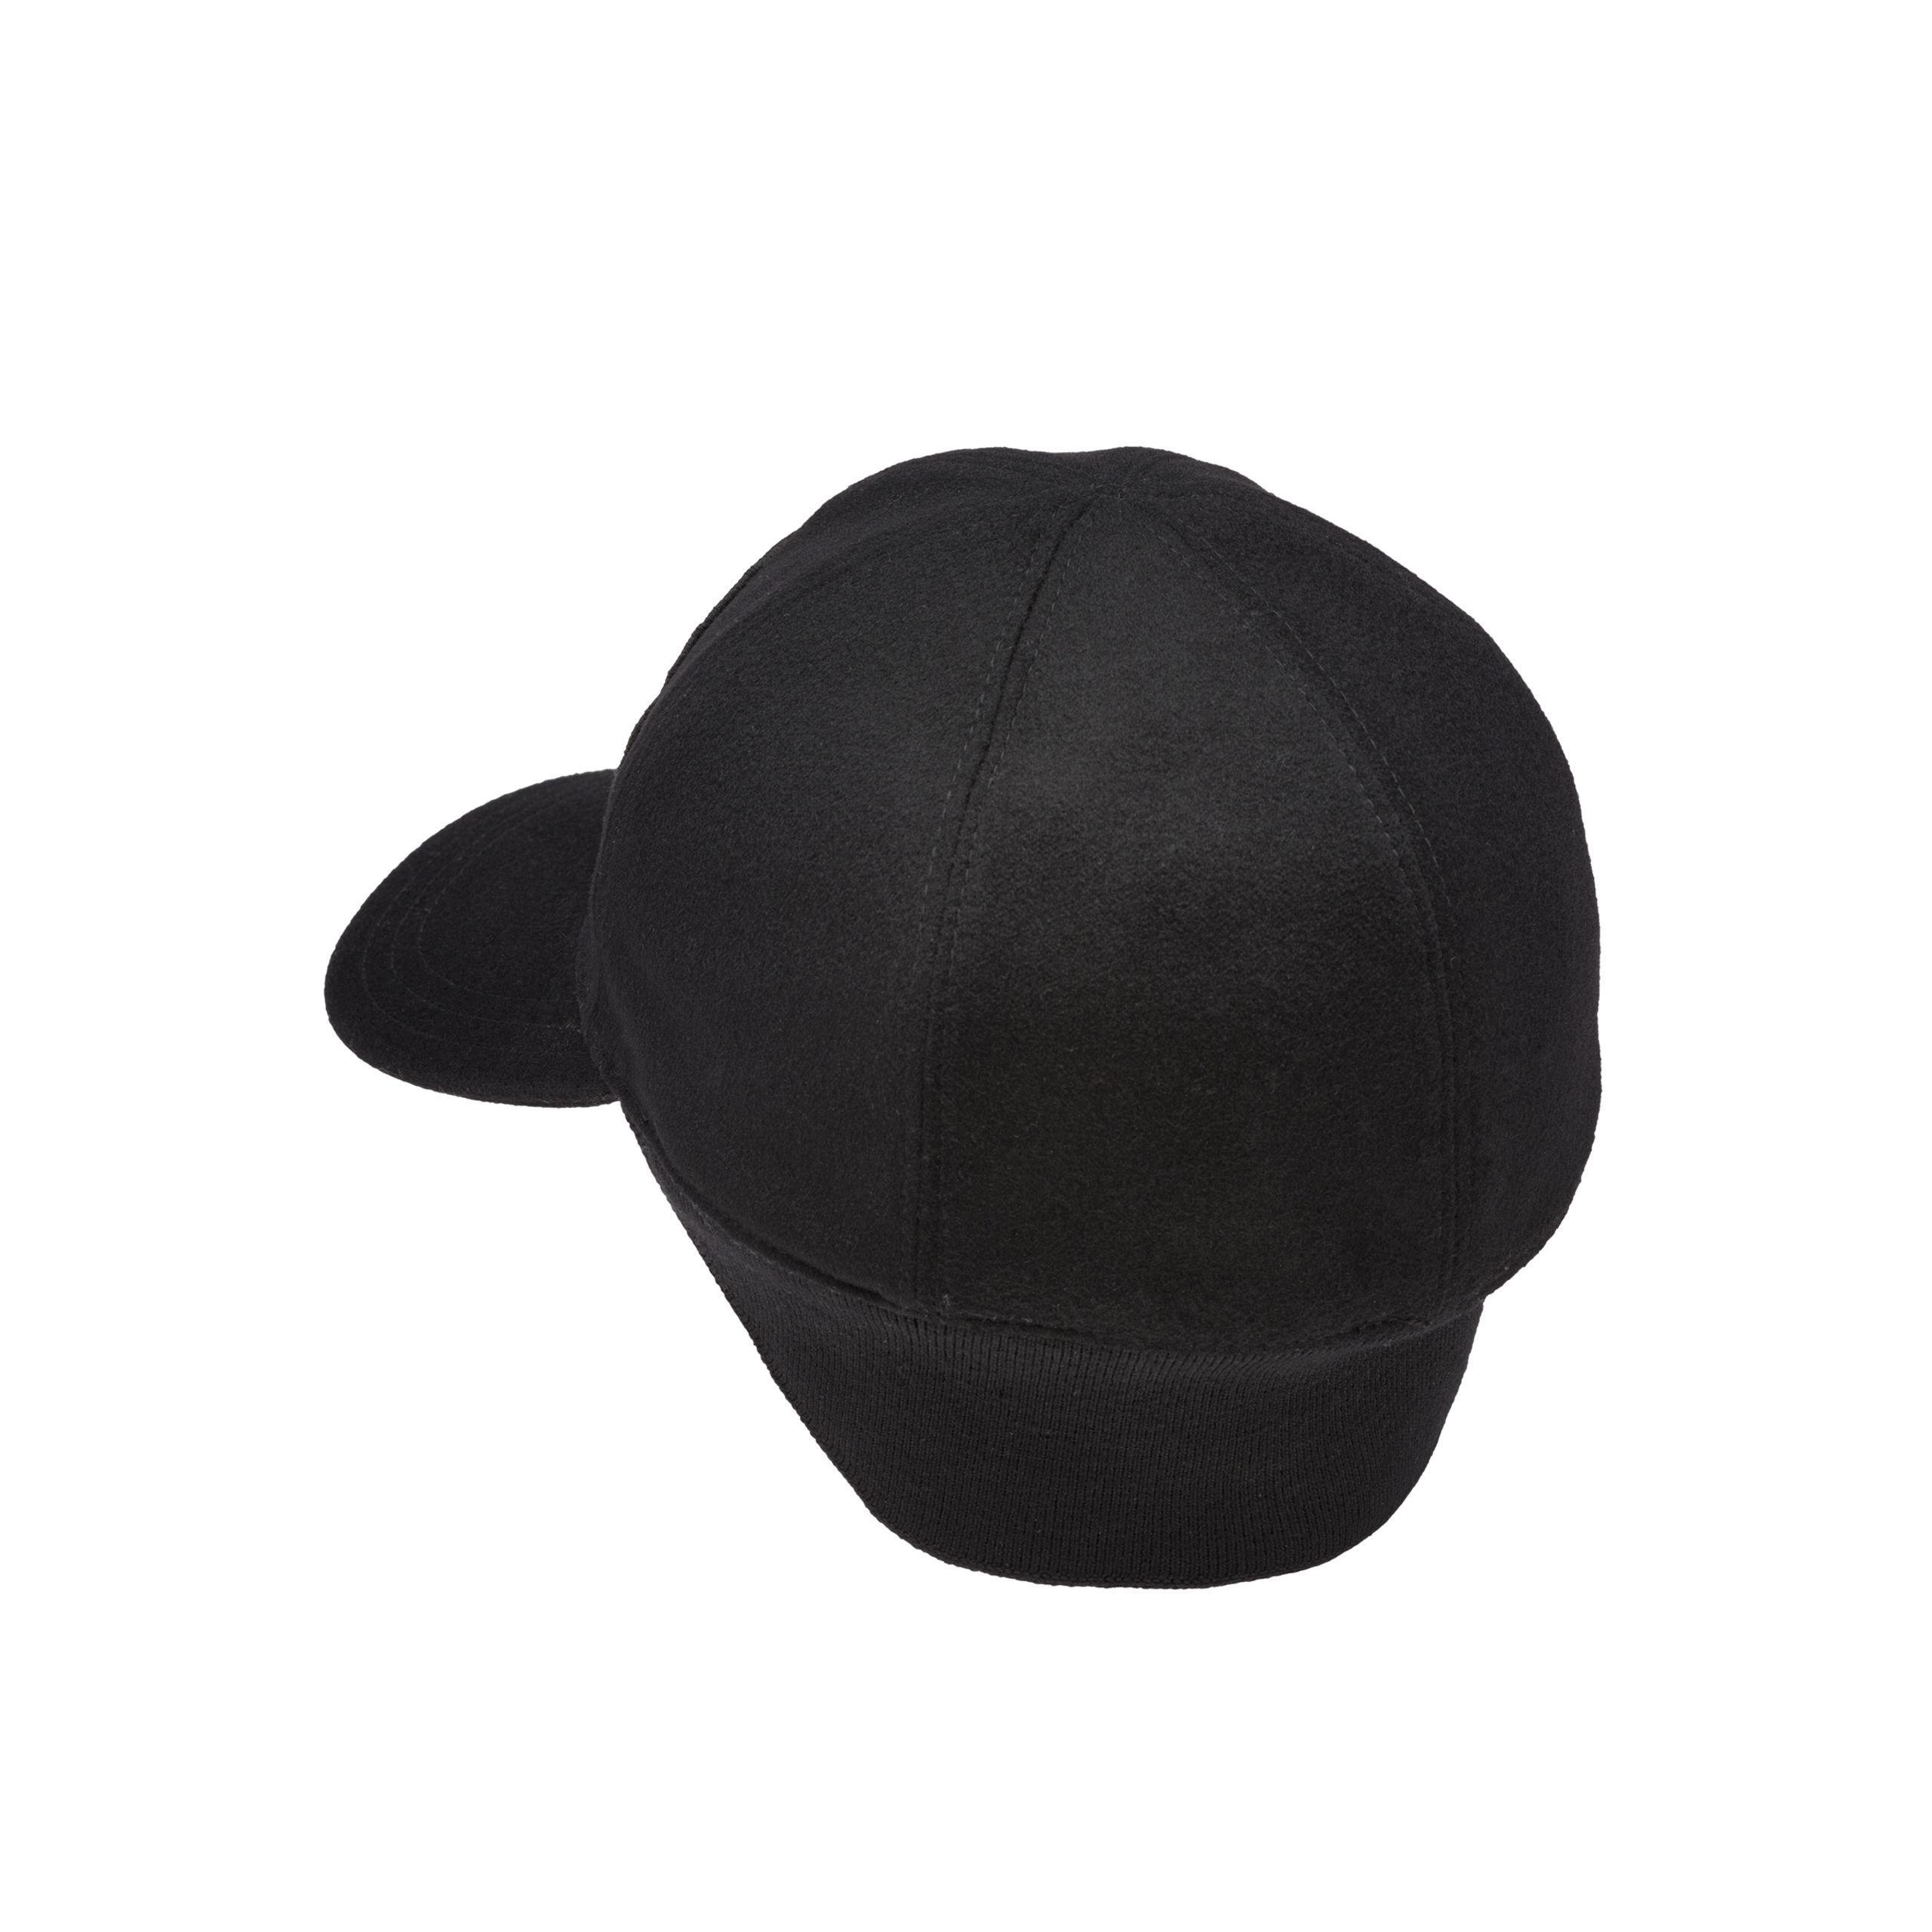 12bf2e7df9f Prada - Black Wool Visor Cap for Men - Lyst. View fullscreen